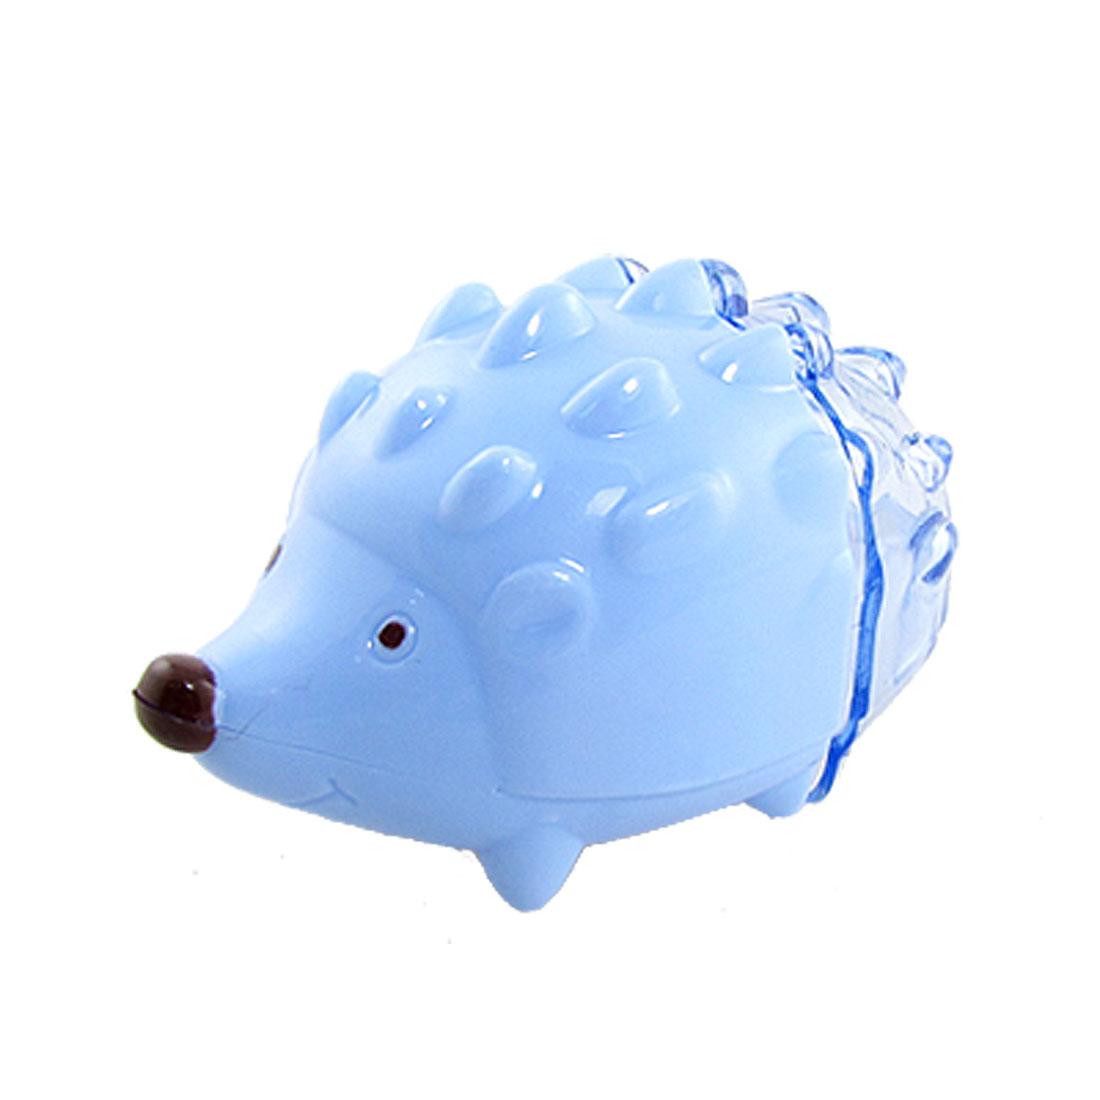 2 Pcs Blue Cute Hedgehog Shaped Double Holes Pencil Sharpener